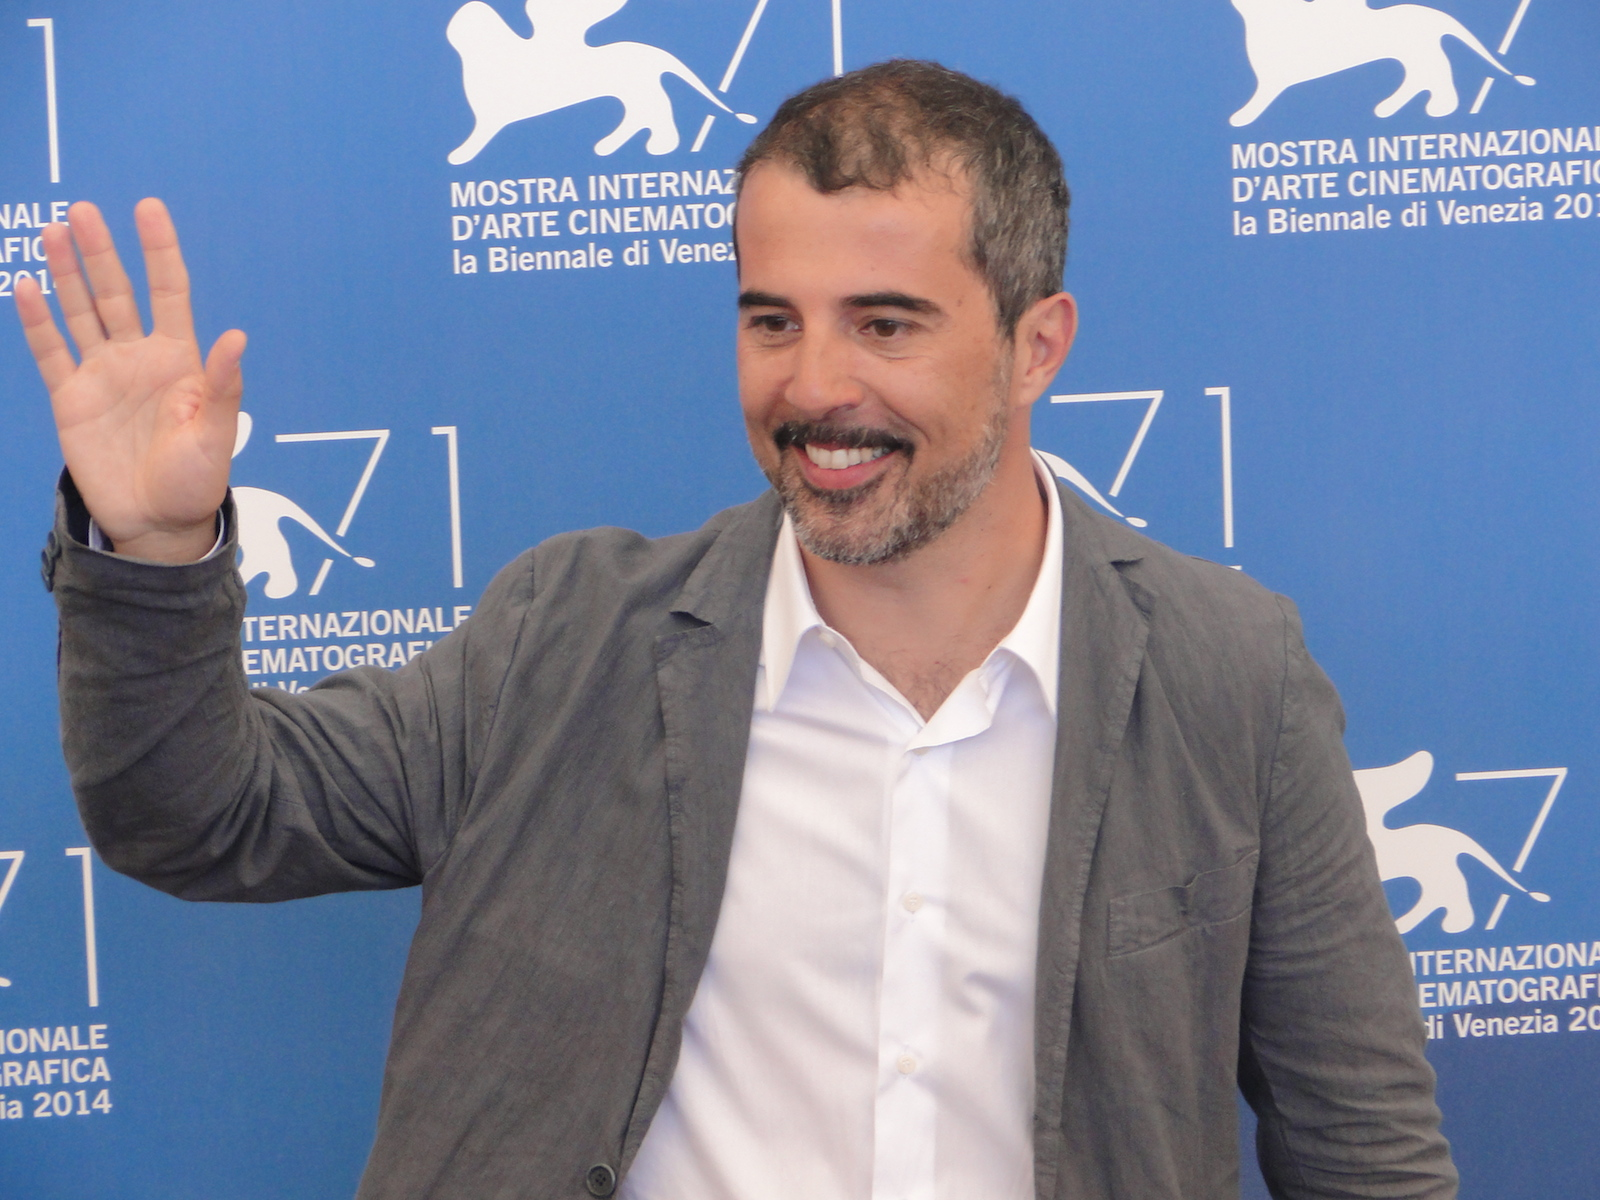 Venezia 2014: Francesco Munzi al photocall di Anime nere